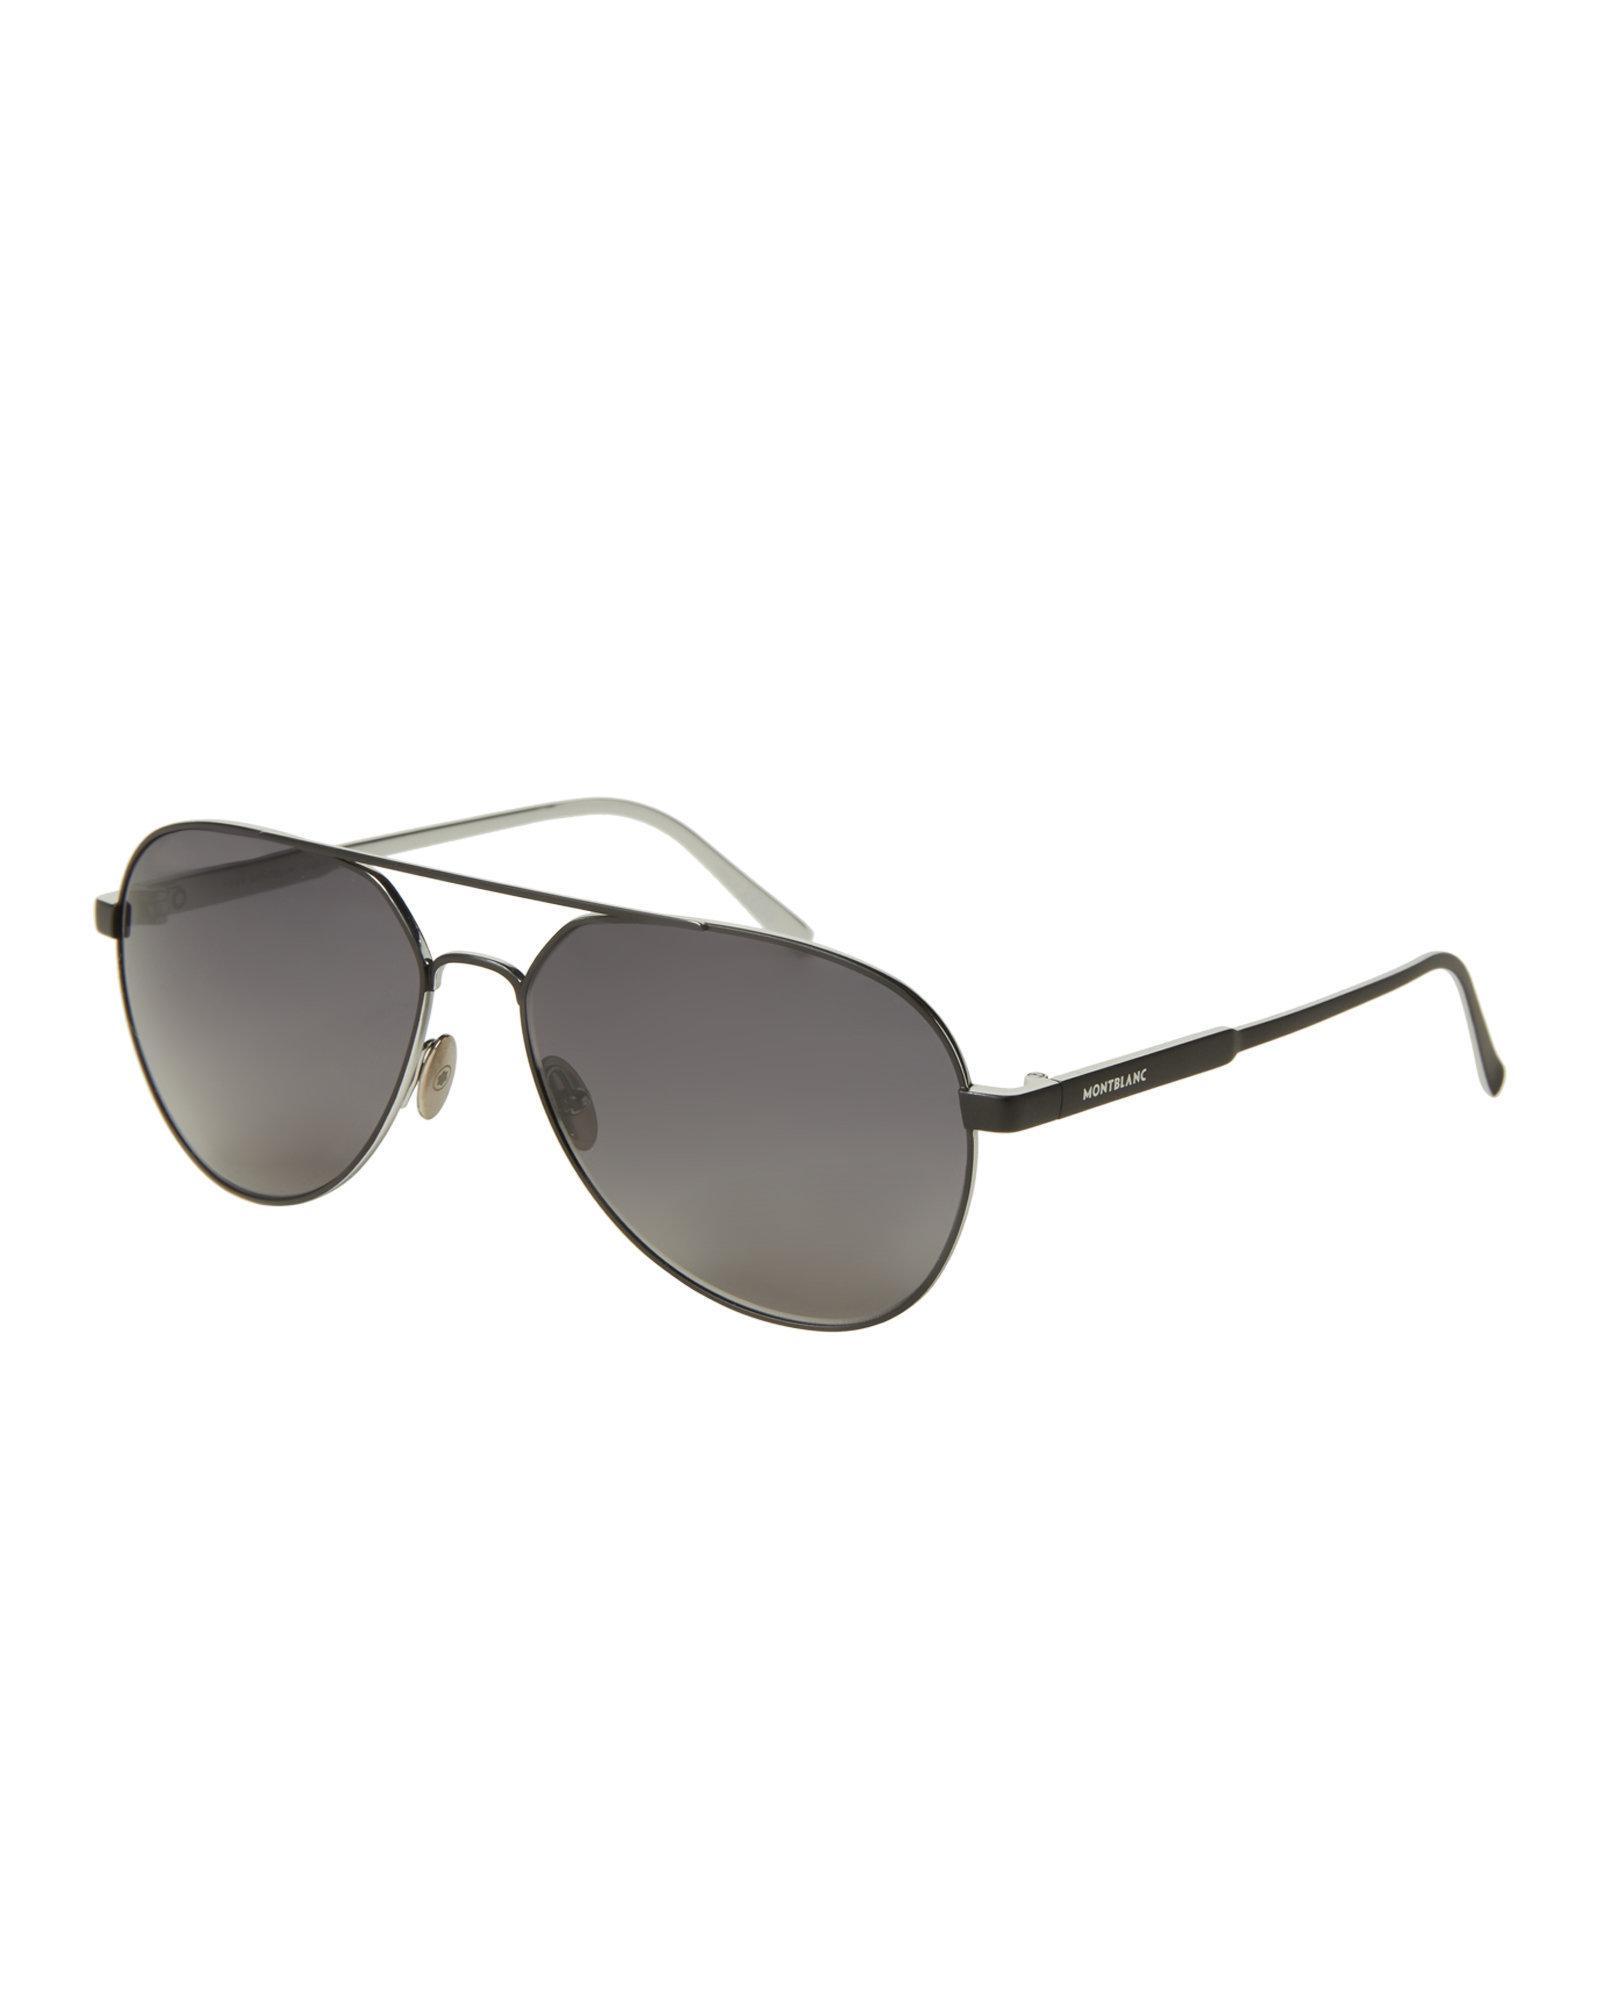 ff428fa037 Lyst - Montblanc Mb 644 s Black Aviator Sunglasses in Black for Men